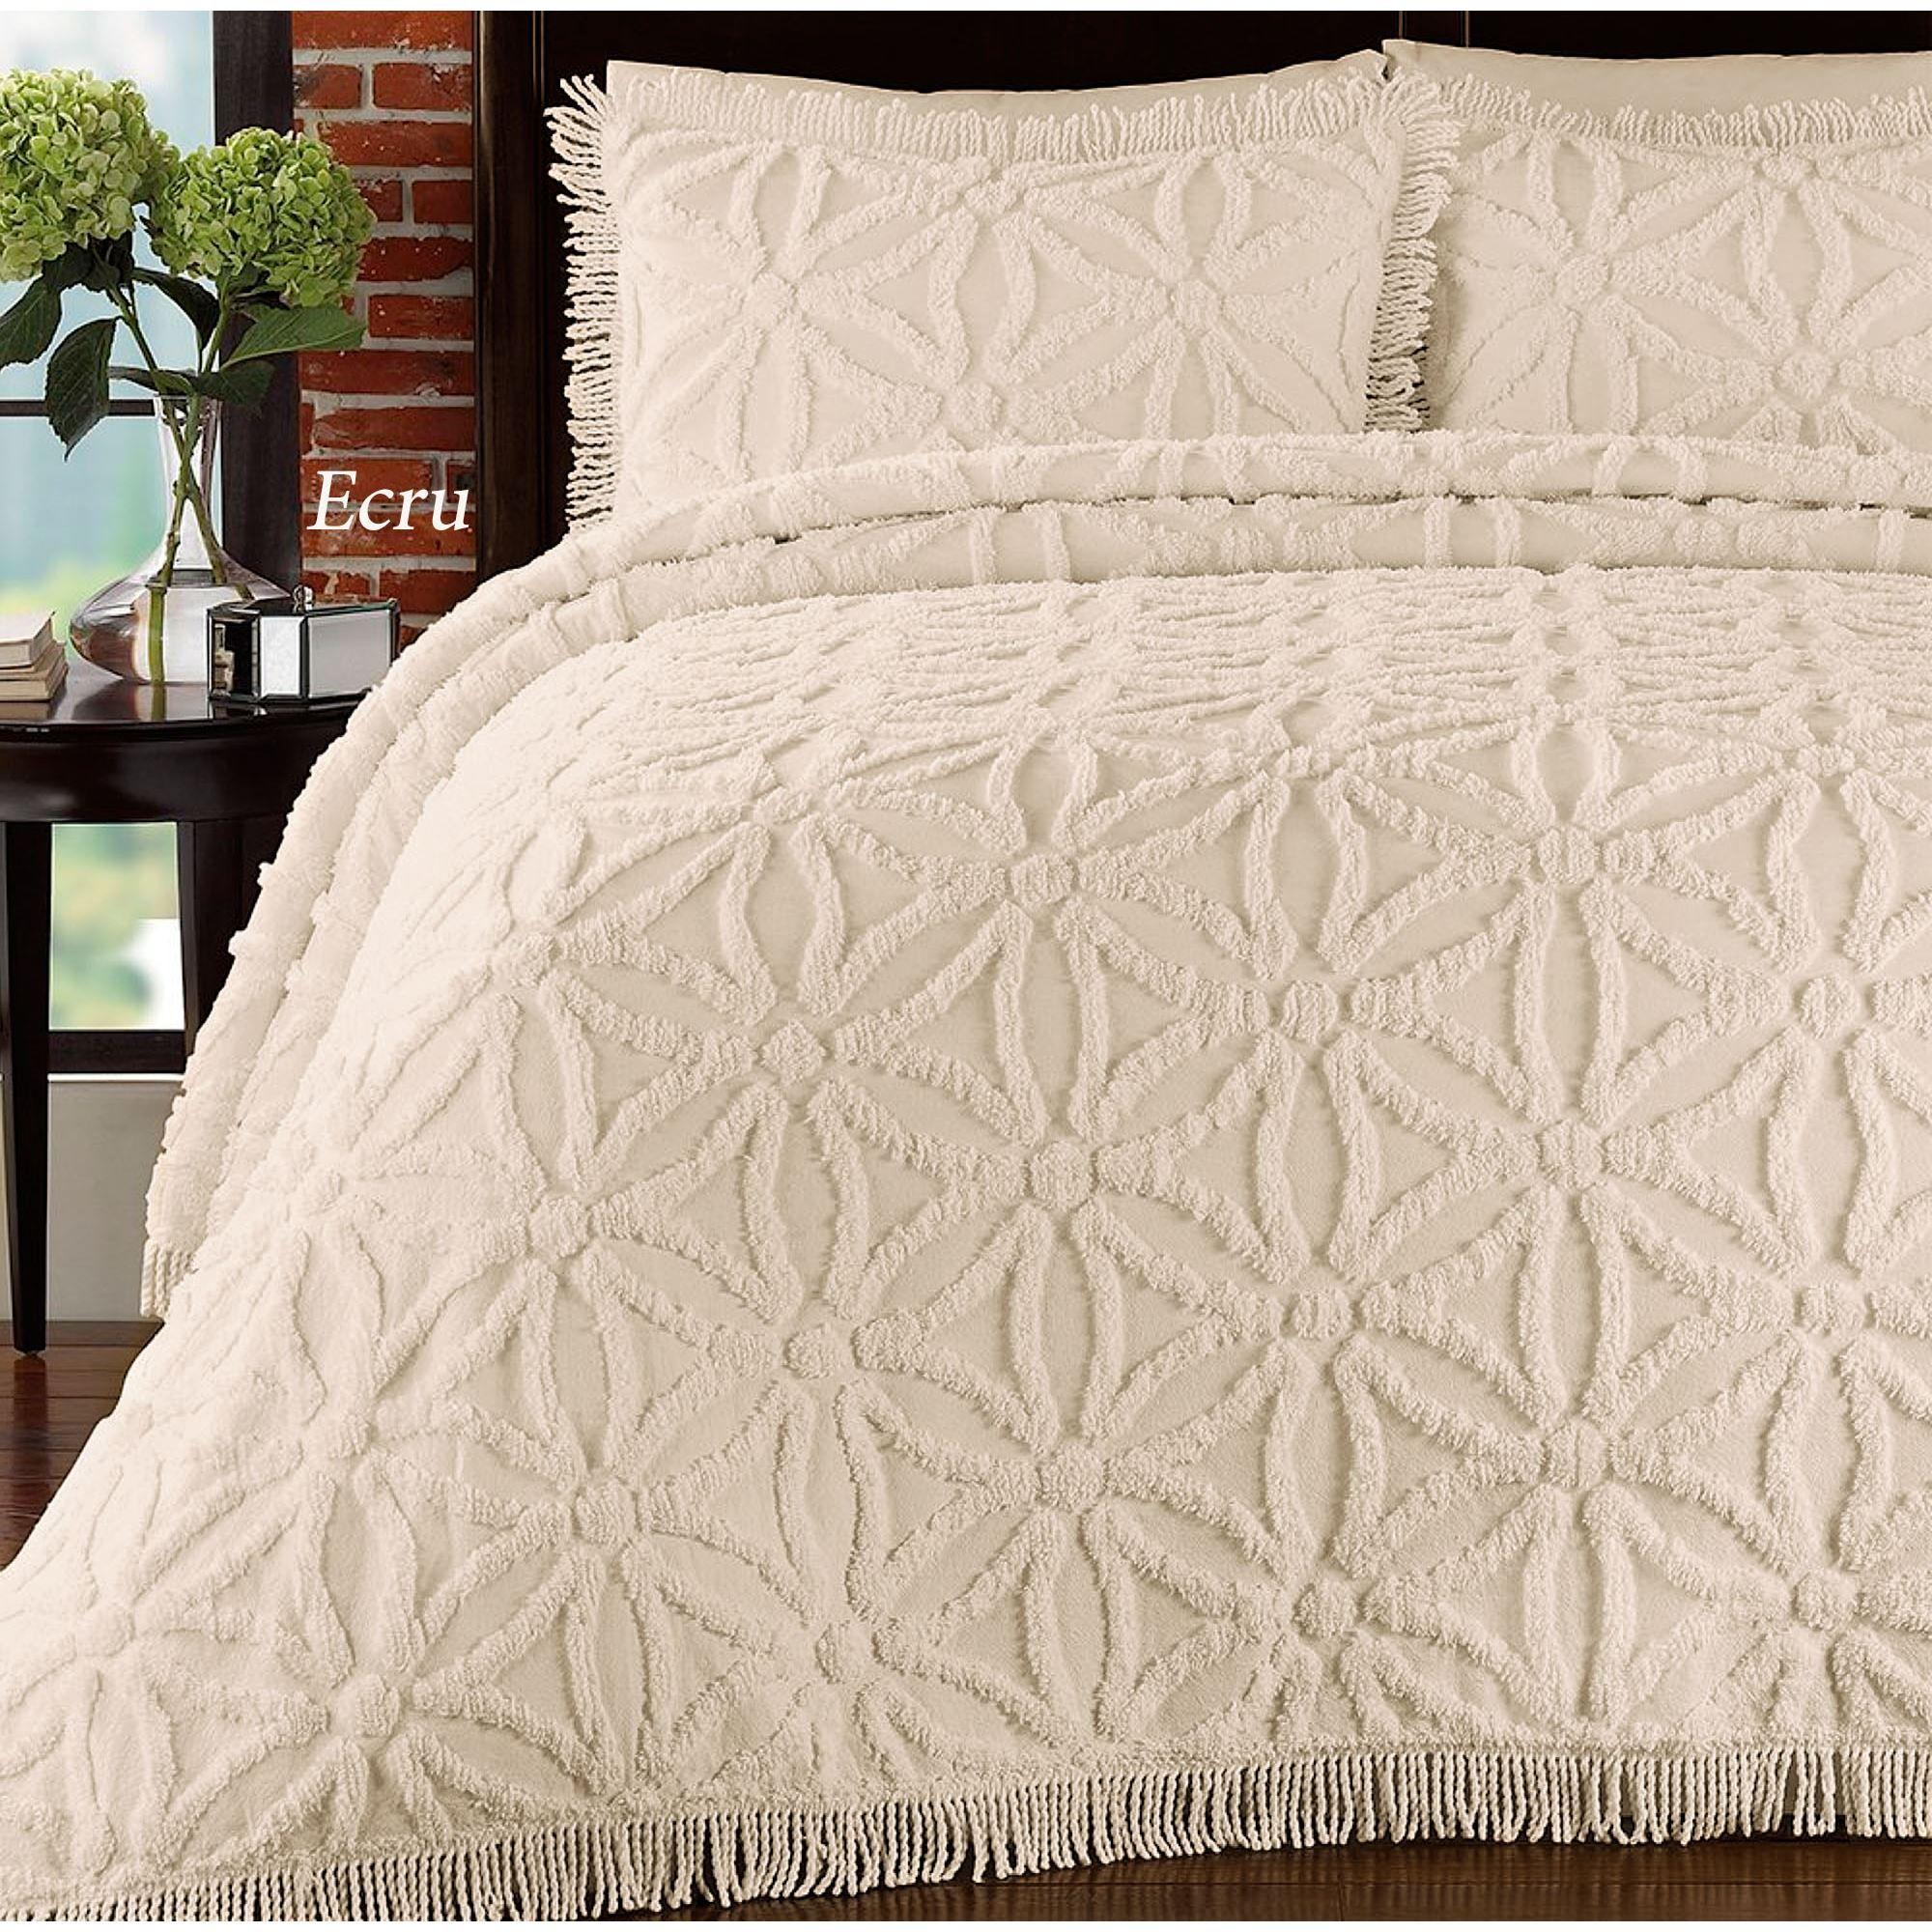 380 GSM Arianna Cotton Chenille Bedspread Set